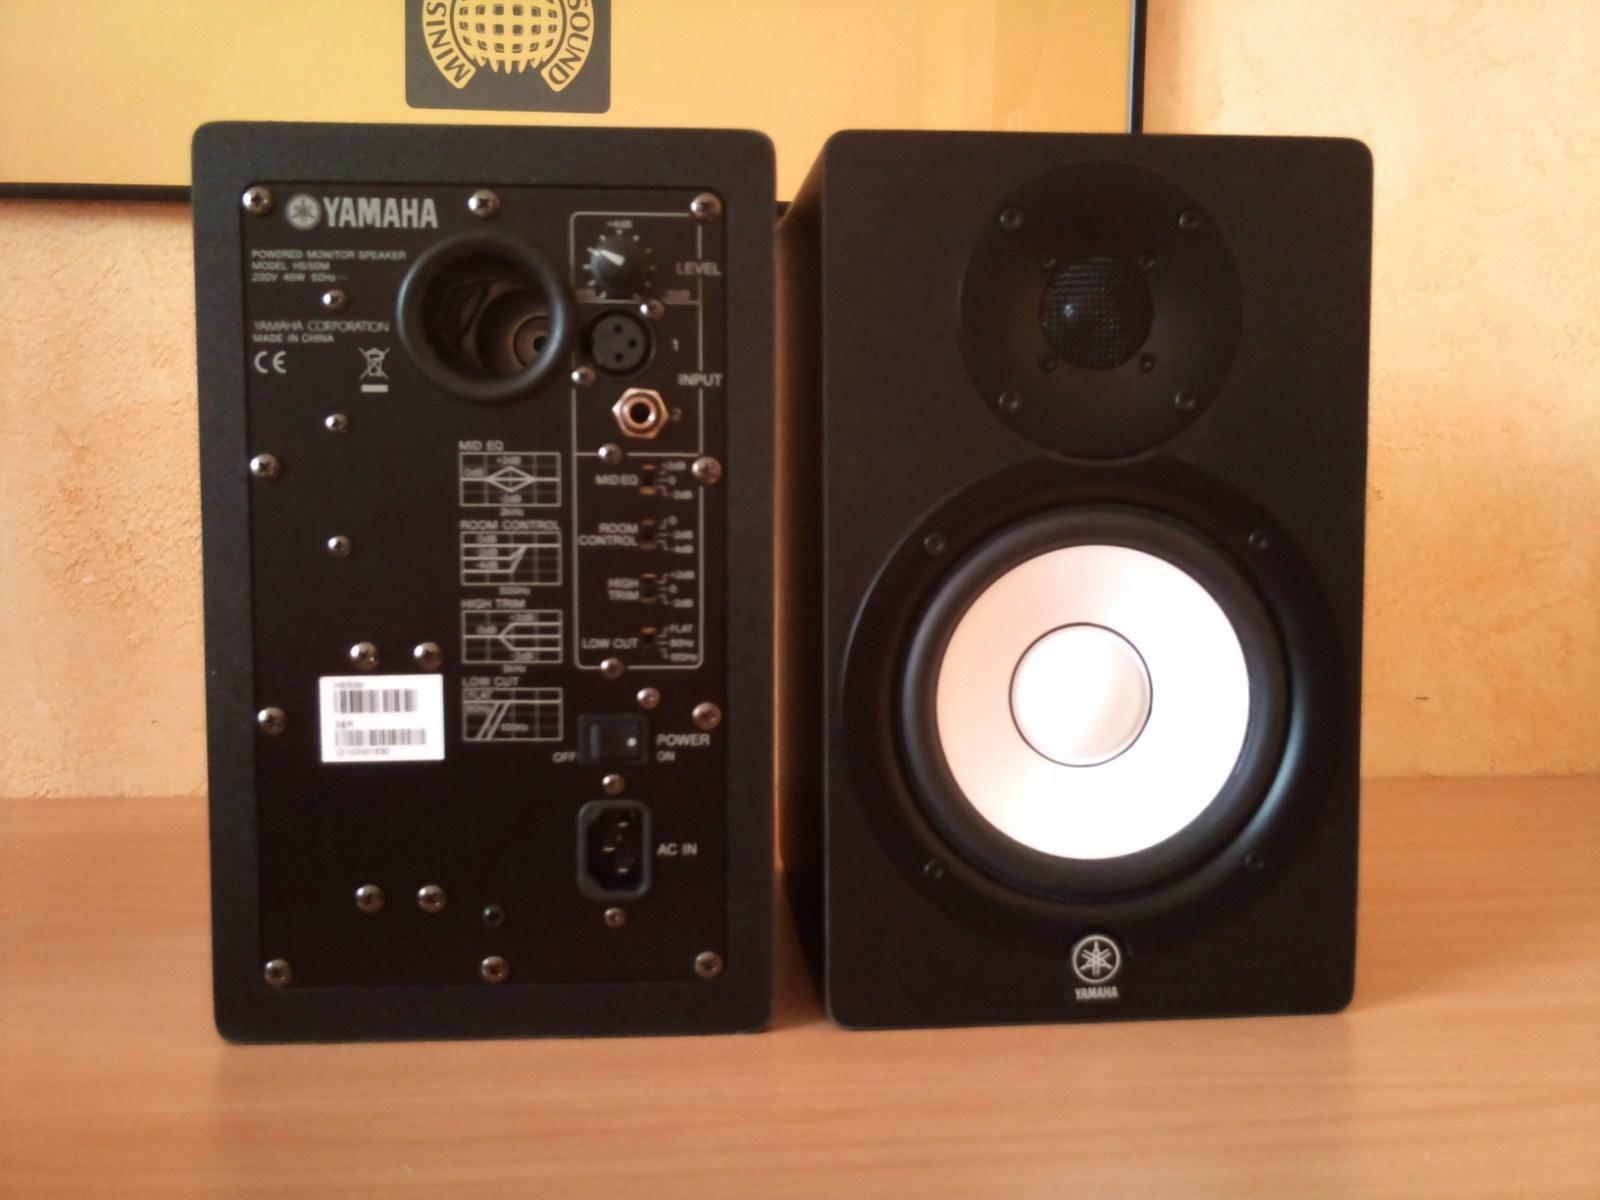 Yamaha hs50m image 1178601 audiofanzine for Yamaha hs50m review